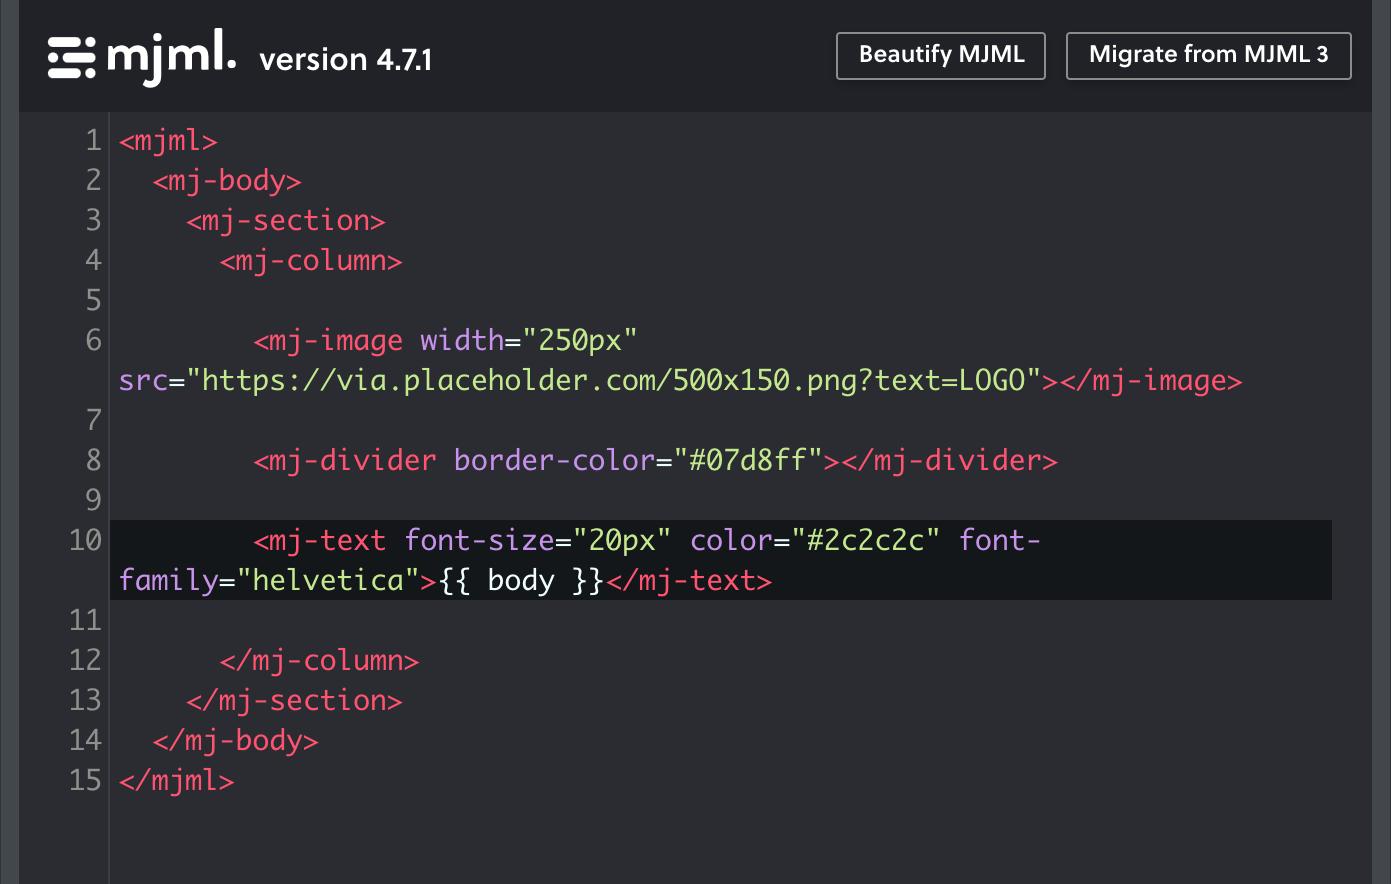 MJML code example